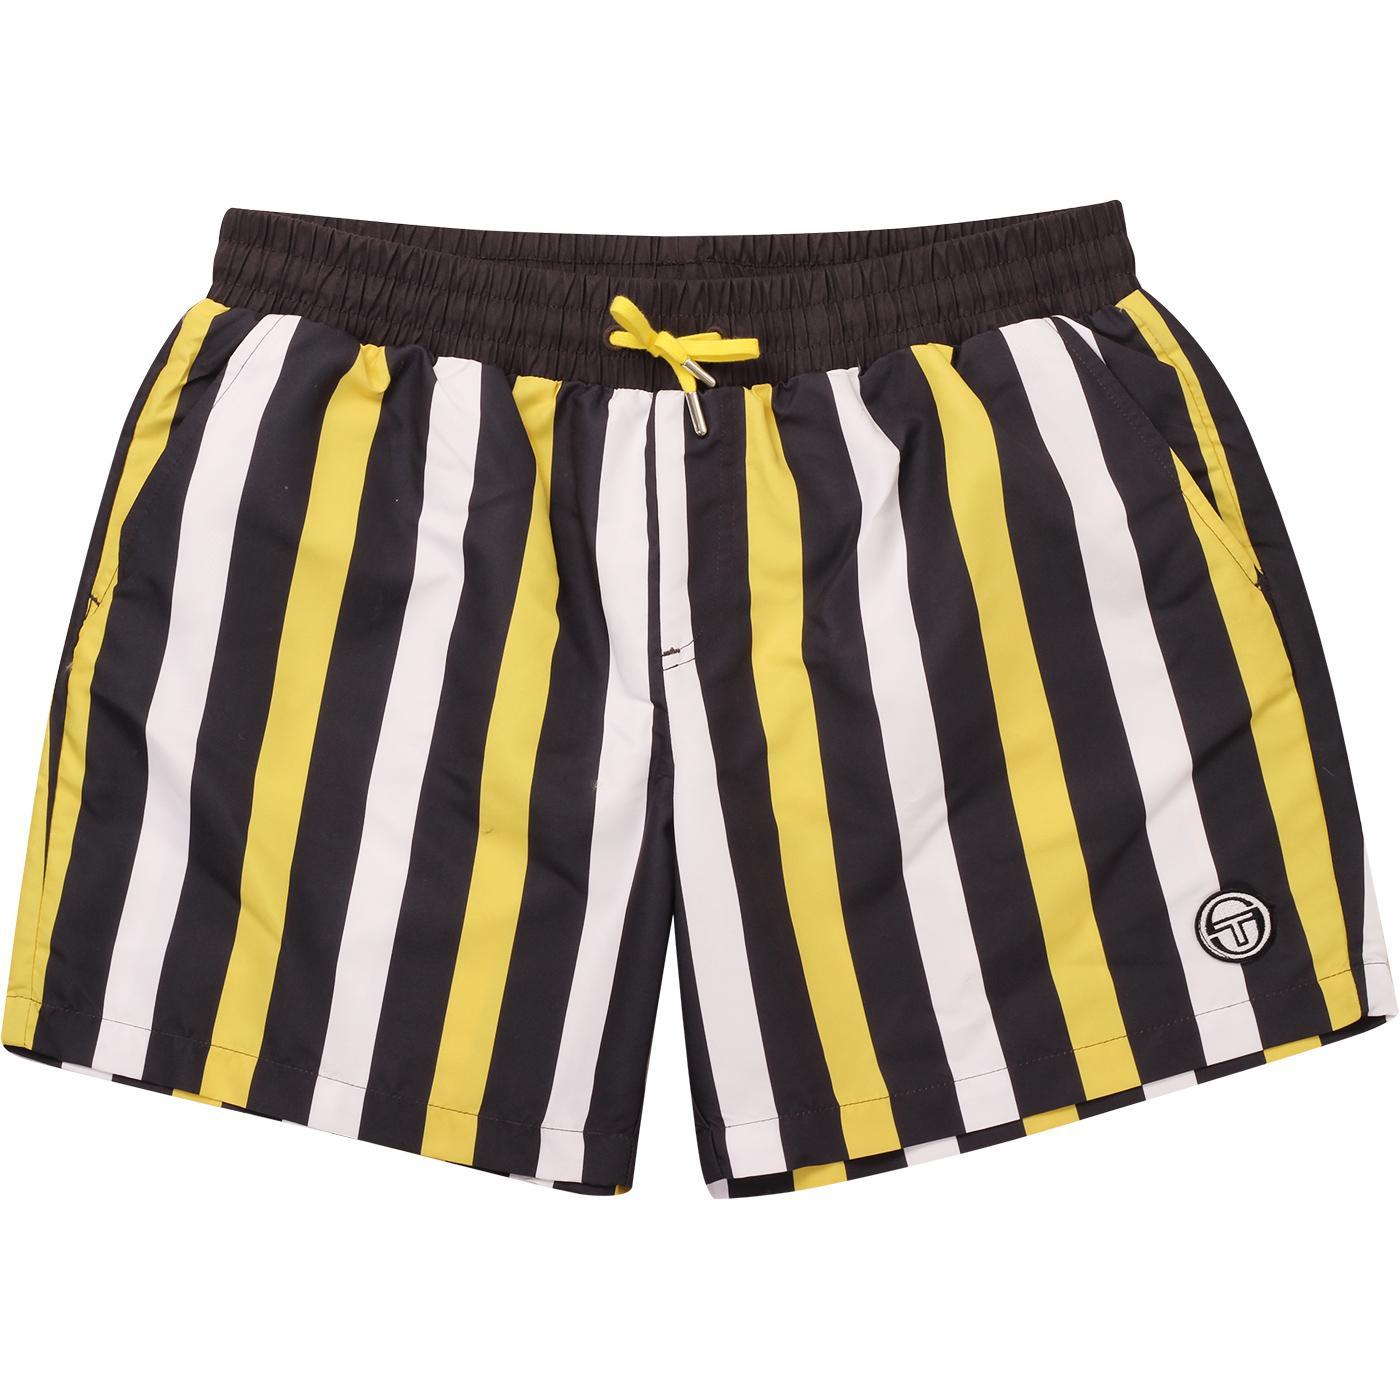 Arrabbiata SERGIO TACCHINI Stripe Swim Shorts (NI)